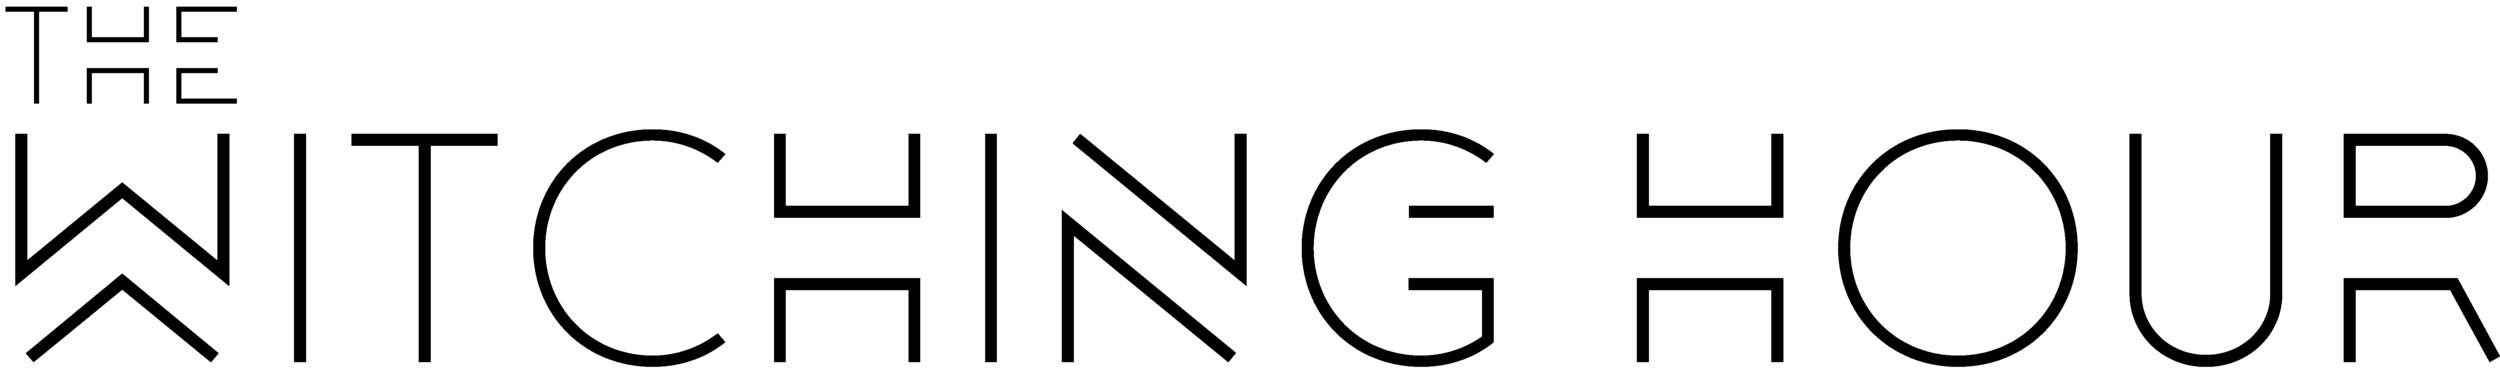 witching logo.png